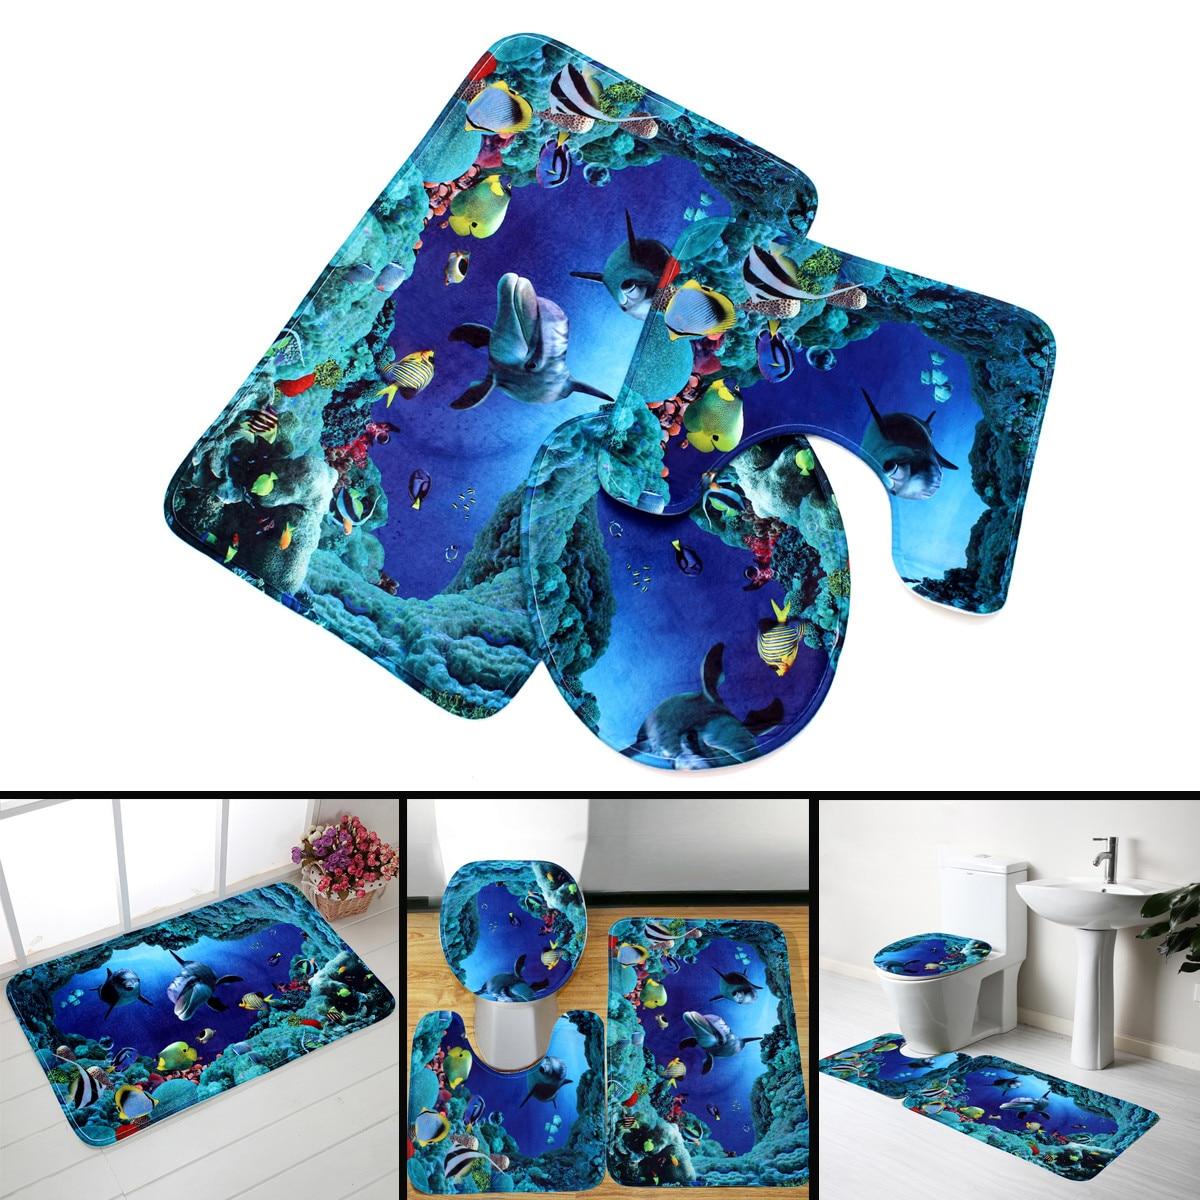 180x180cm Deep Sea Shark Bathroom Shower Curtain Toilet Non Slip Cover Mat Set